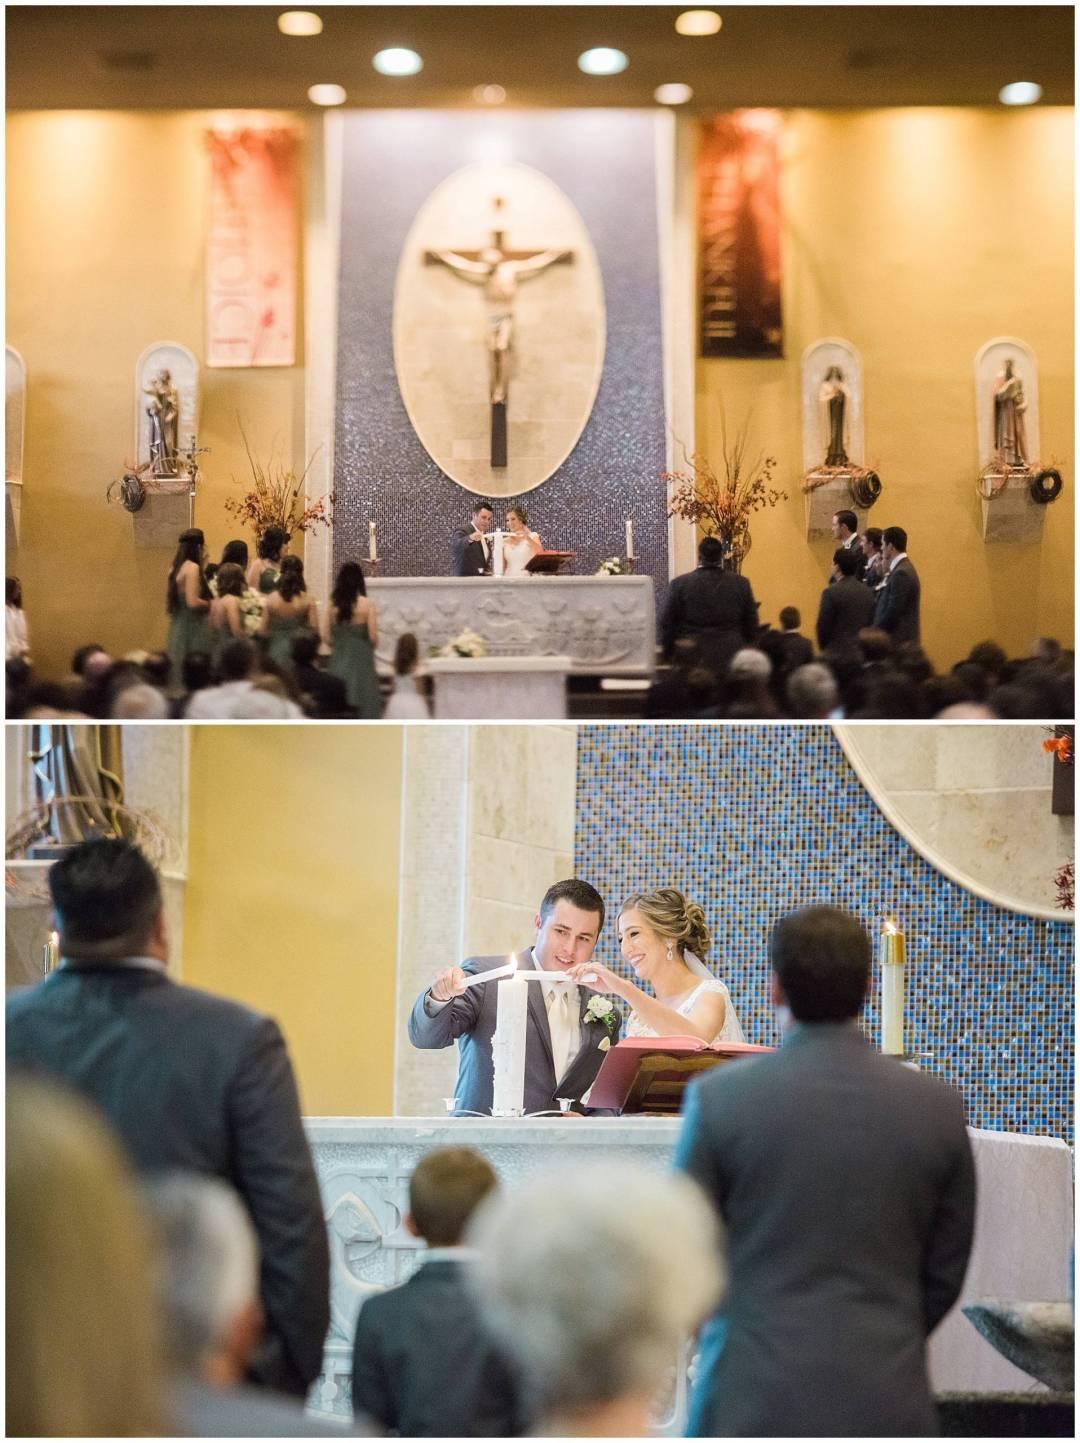 Kelcie & Devin Wedding Third Element Photography & Cinema Koetsier Ranch Visalia Tulare Fresno Hybrid Film Wedding Photographer_0018